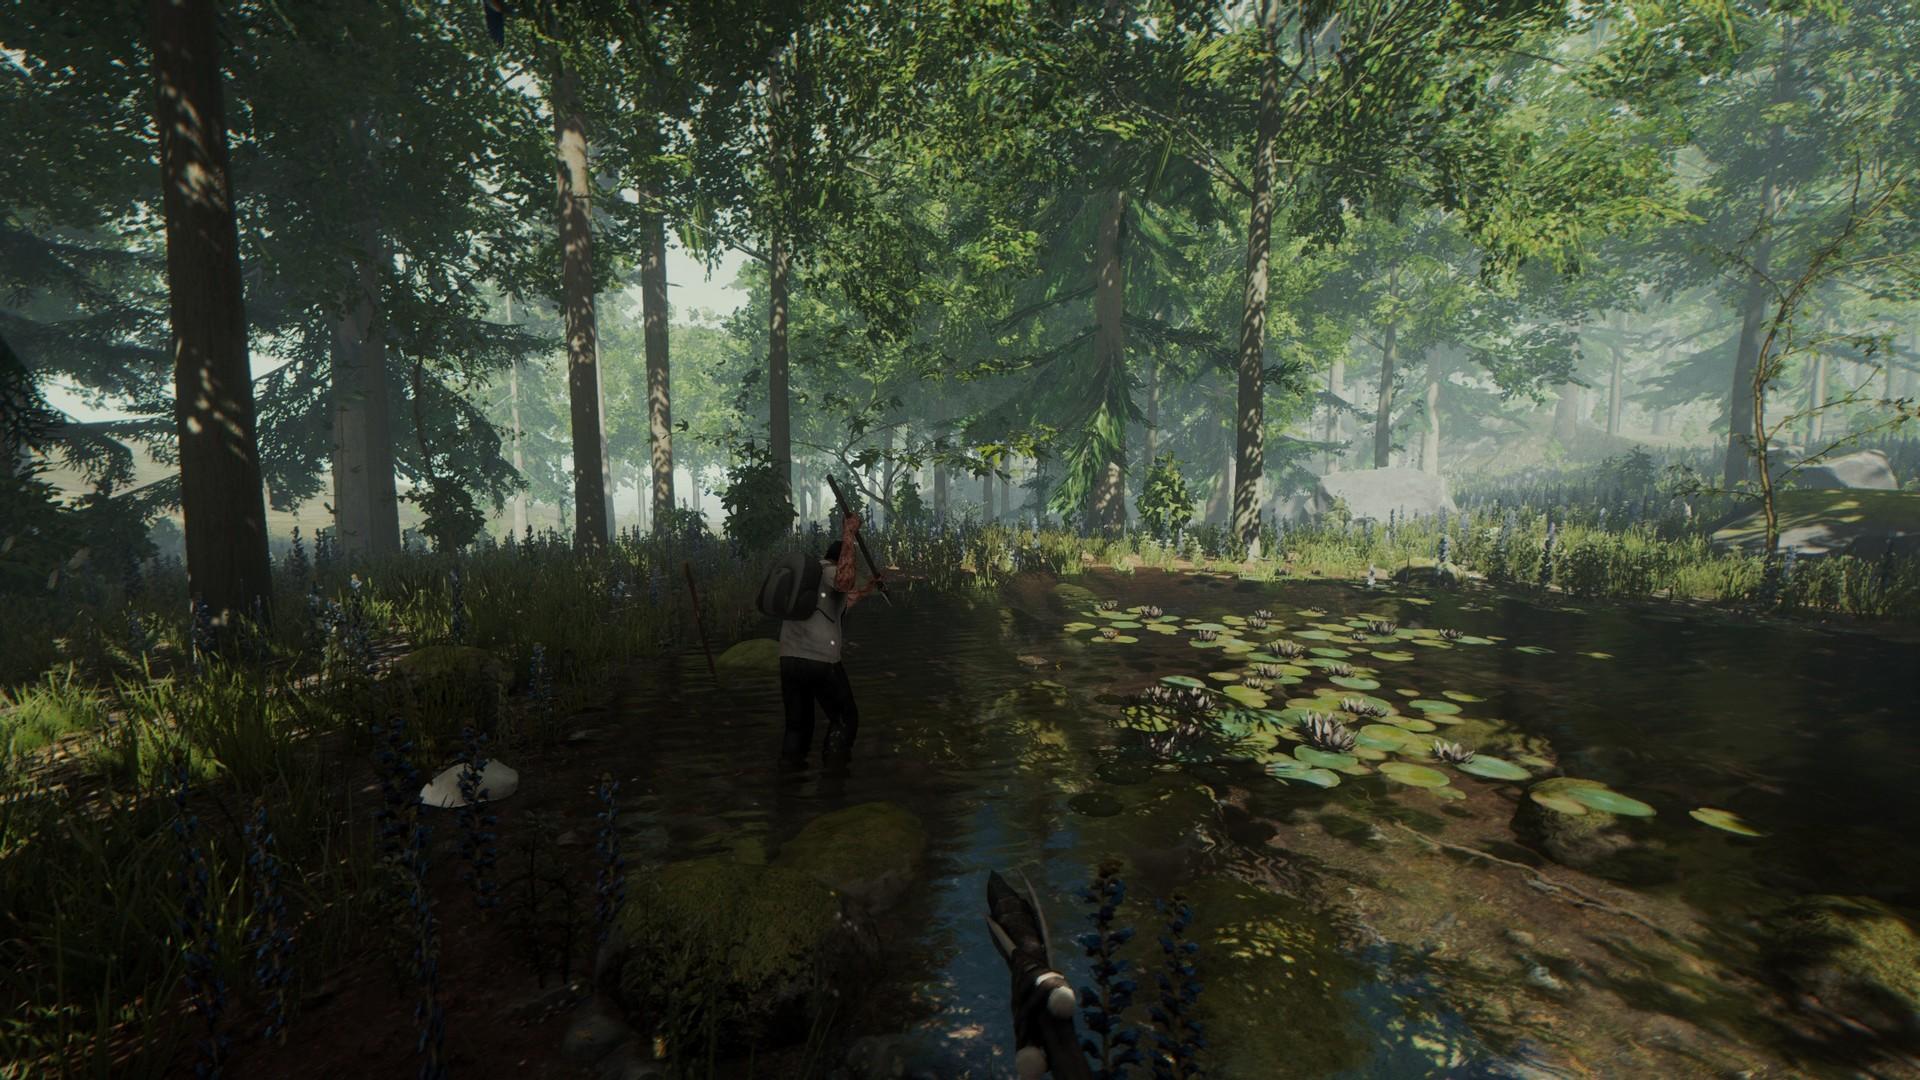 The Forest Resimleri